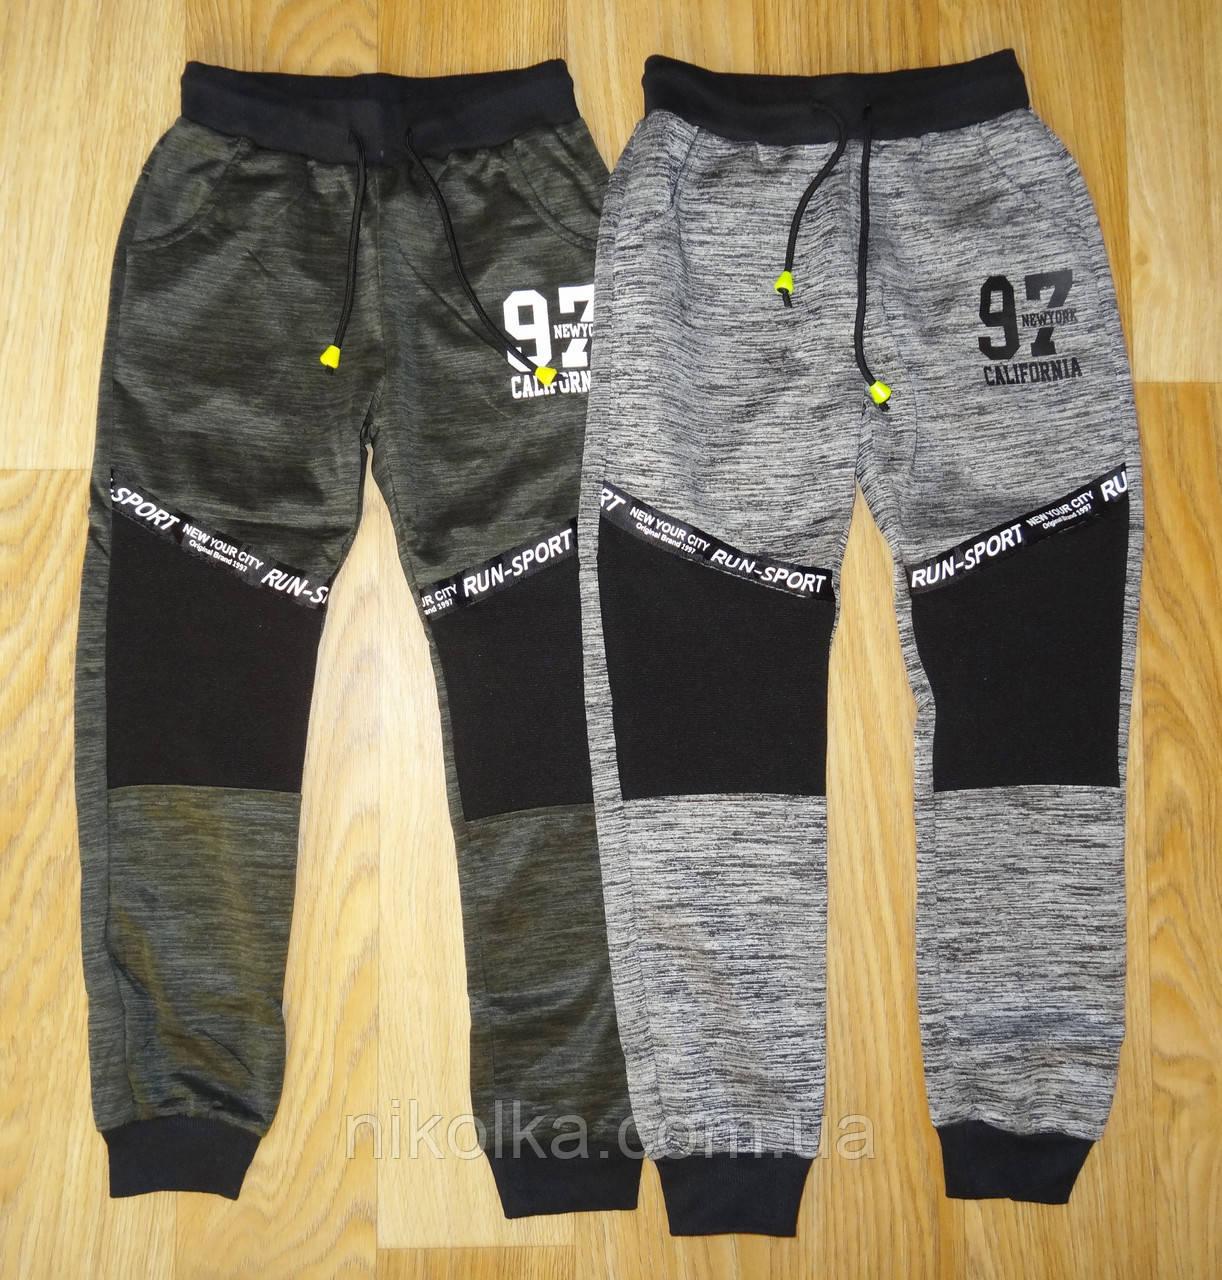 fc07c9249637 Спортивные брюки для мальчика оптом, Glo-story, 134-164 рр., арт ...